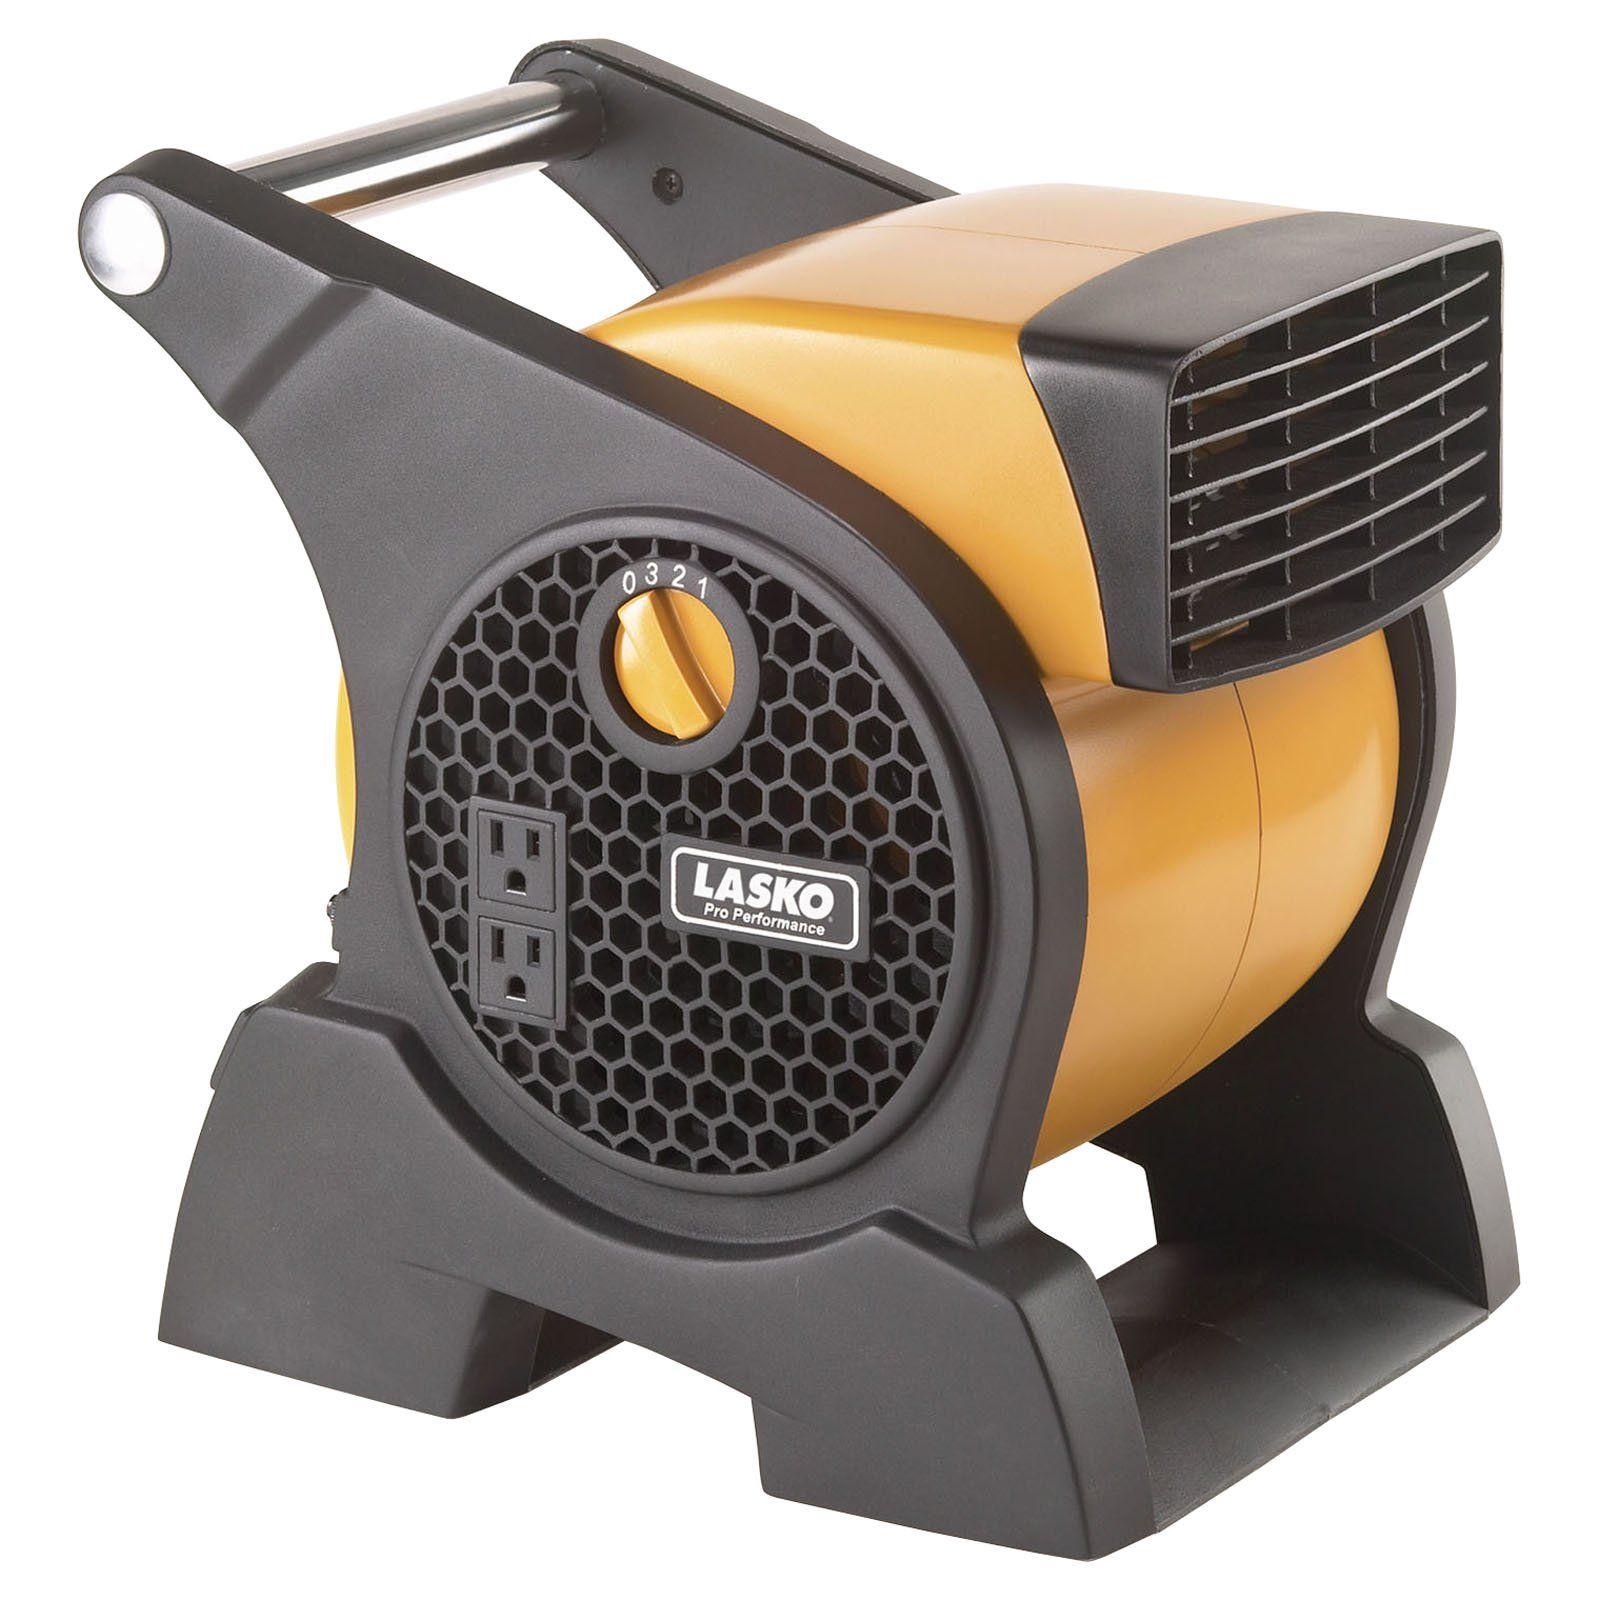 Lasko Pro Performance High Velocity Utility Fan Yellow Portable